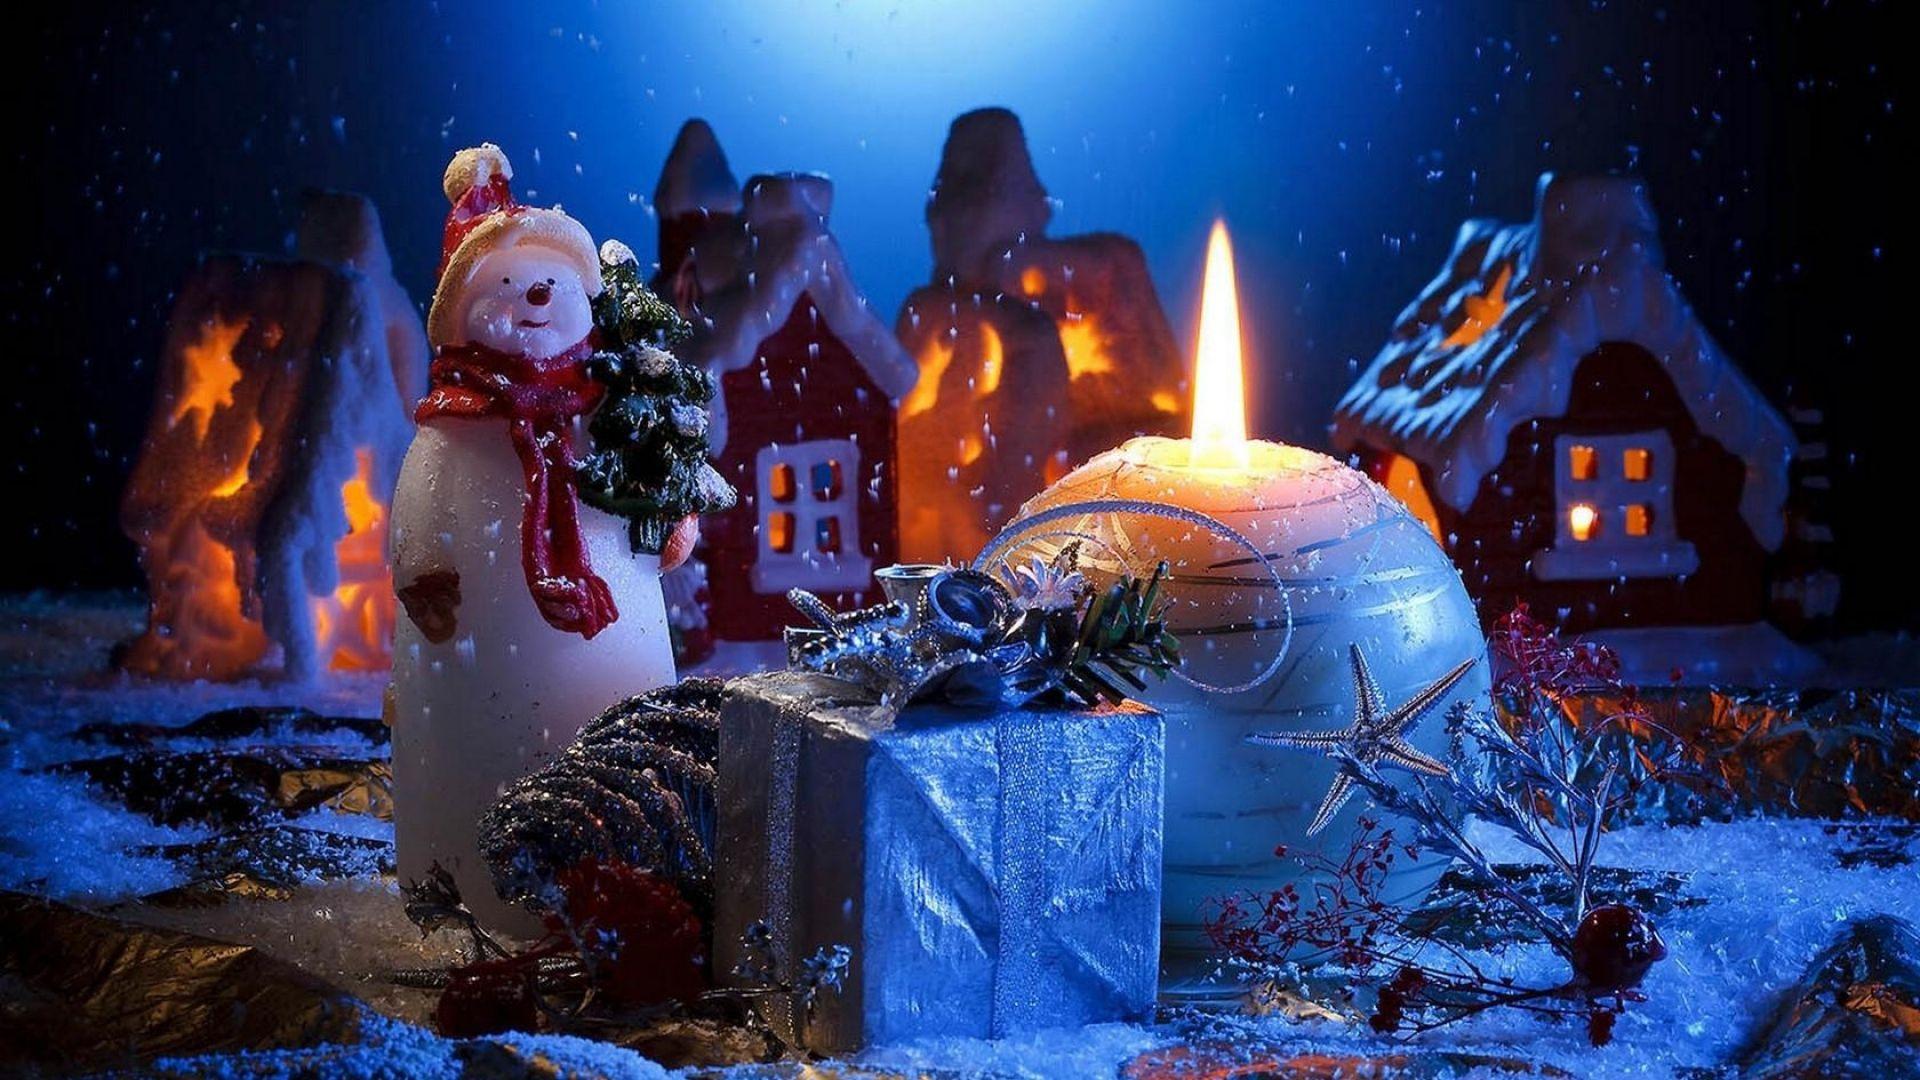 Merry Christmas HD Pics 2015 Fun lol Fun Christmas